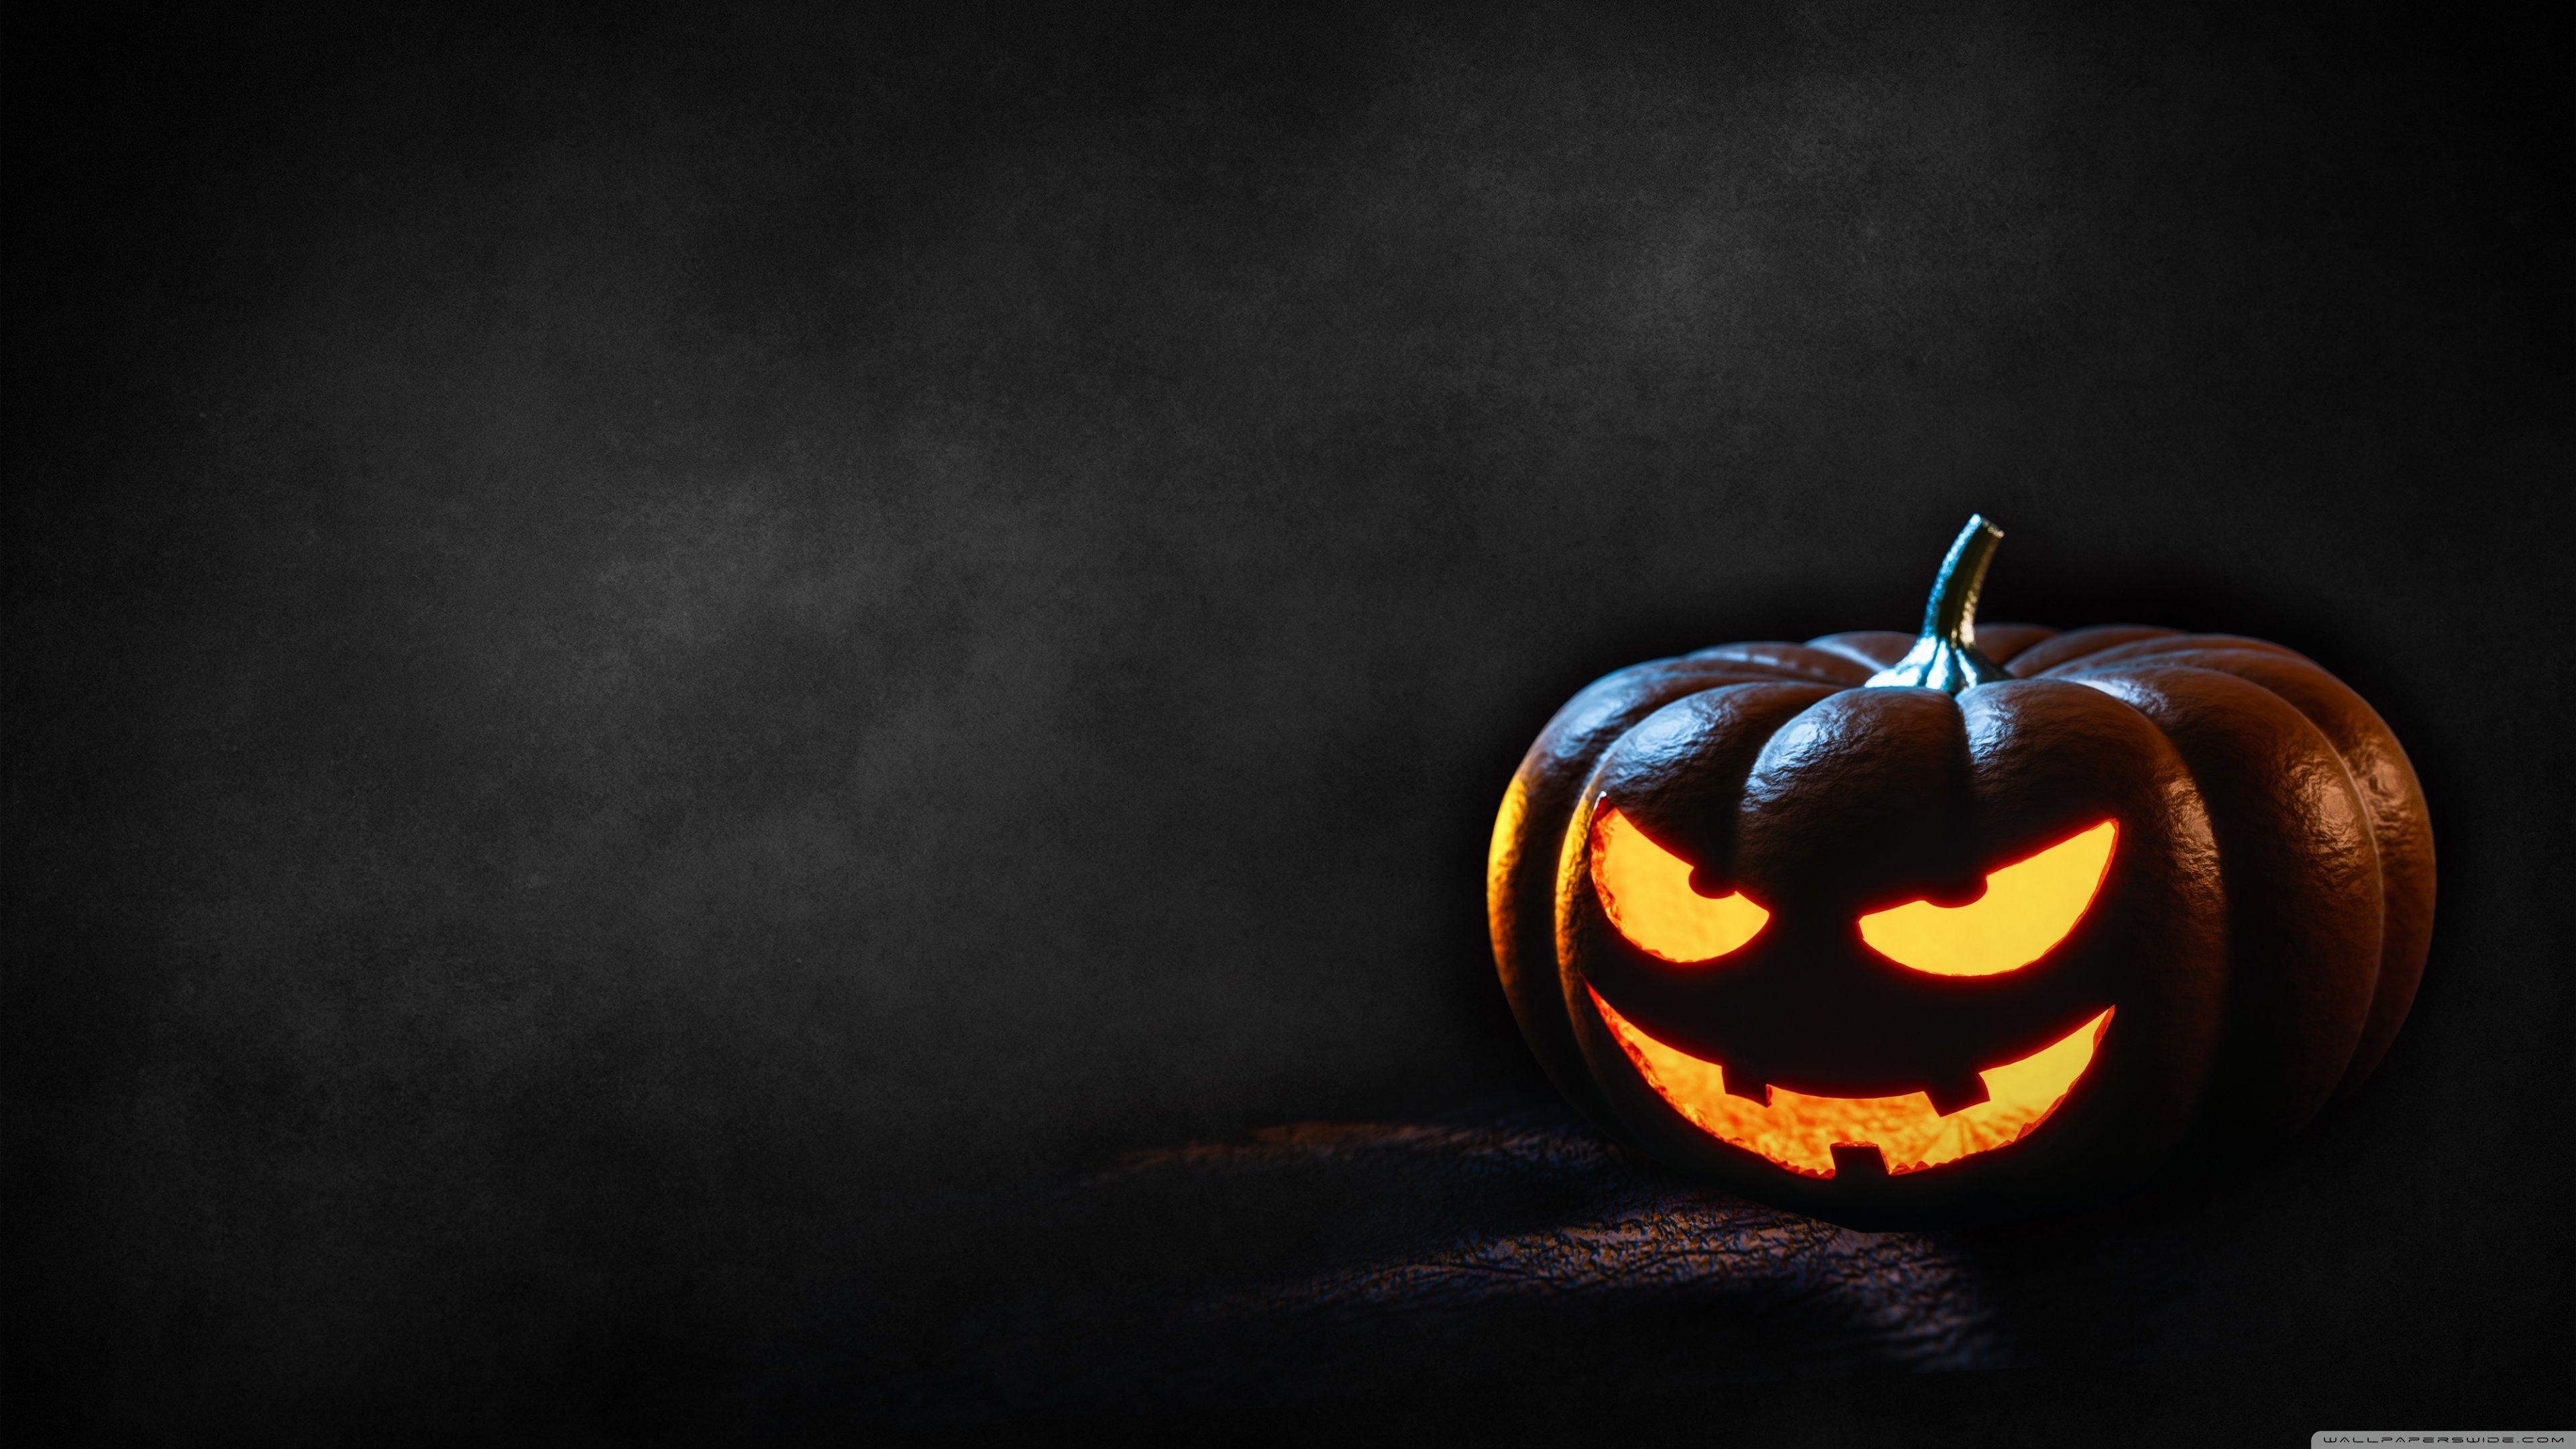 Halloween Images Hd.Halloween Wallpapers Hd Wallpaper Cave